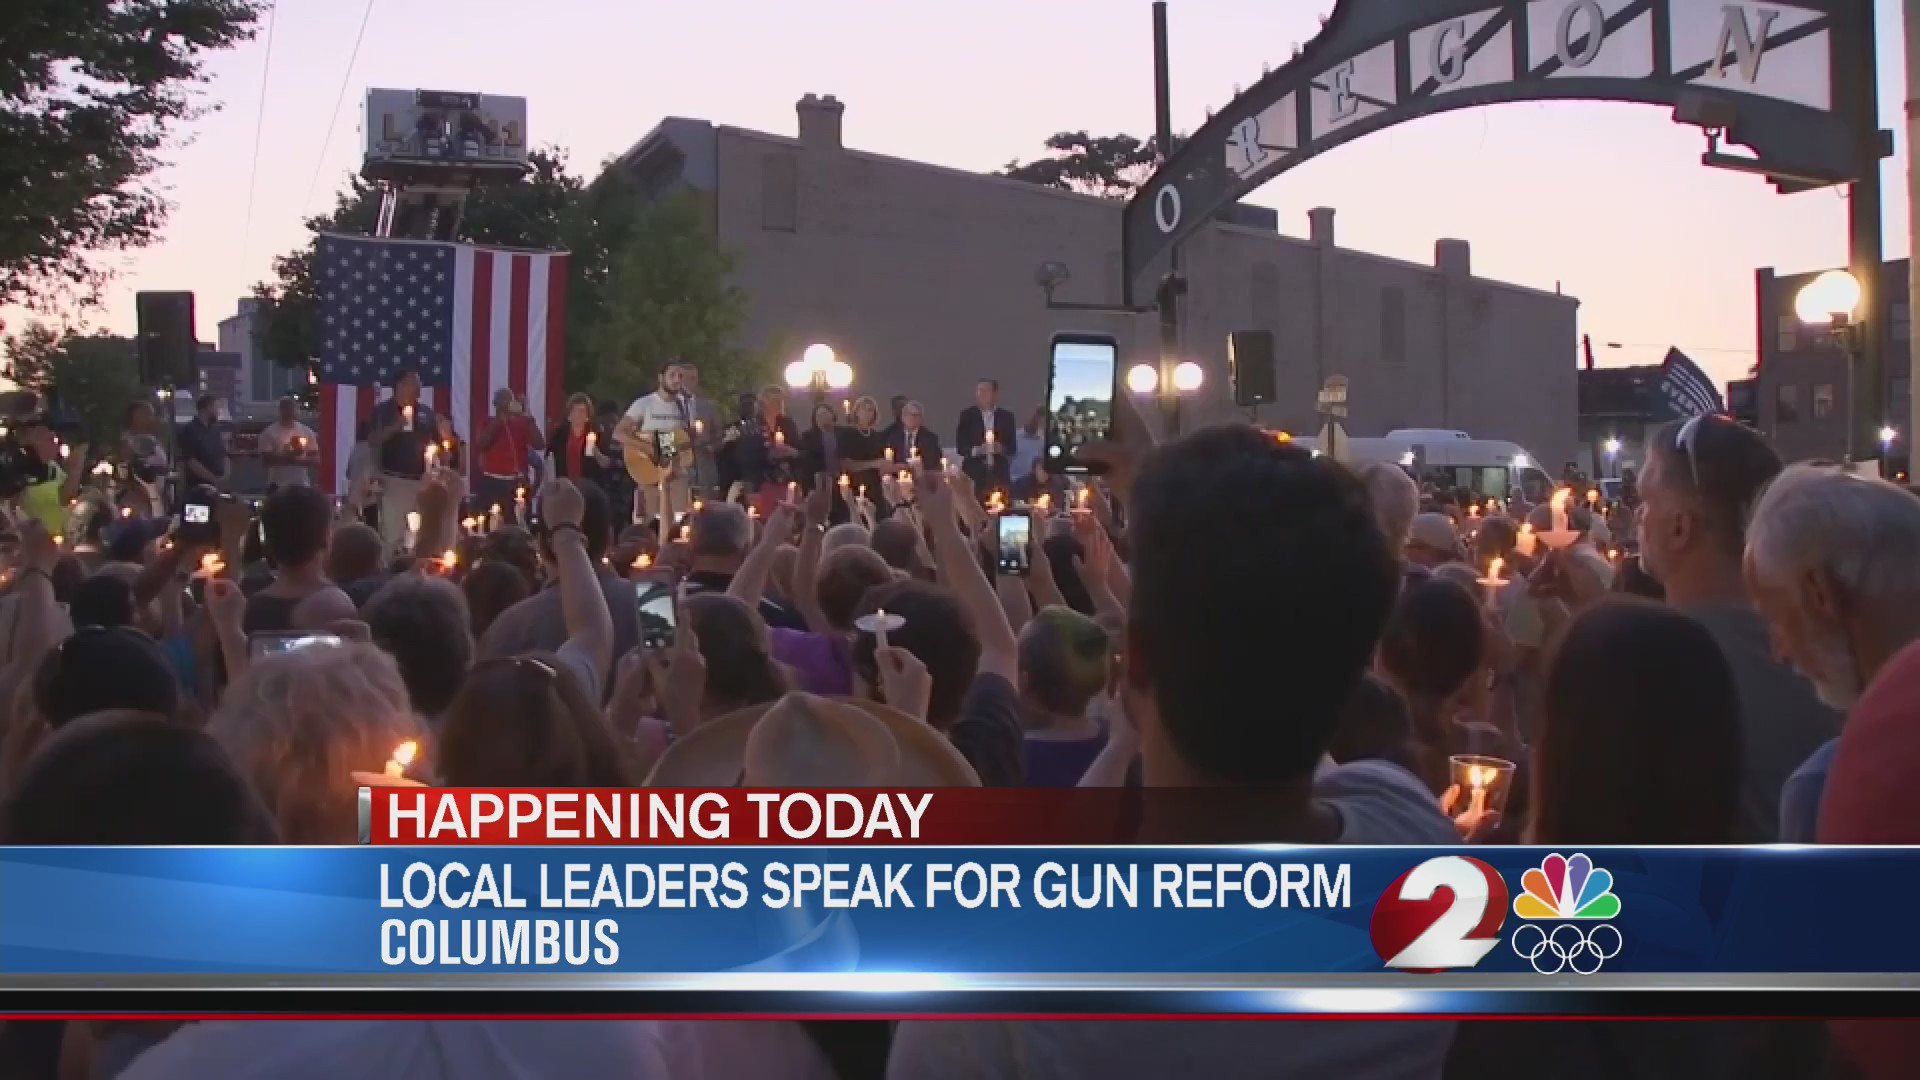 Local leaders speak for gun reform 9-19